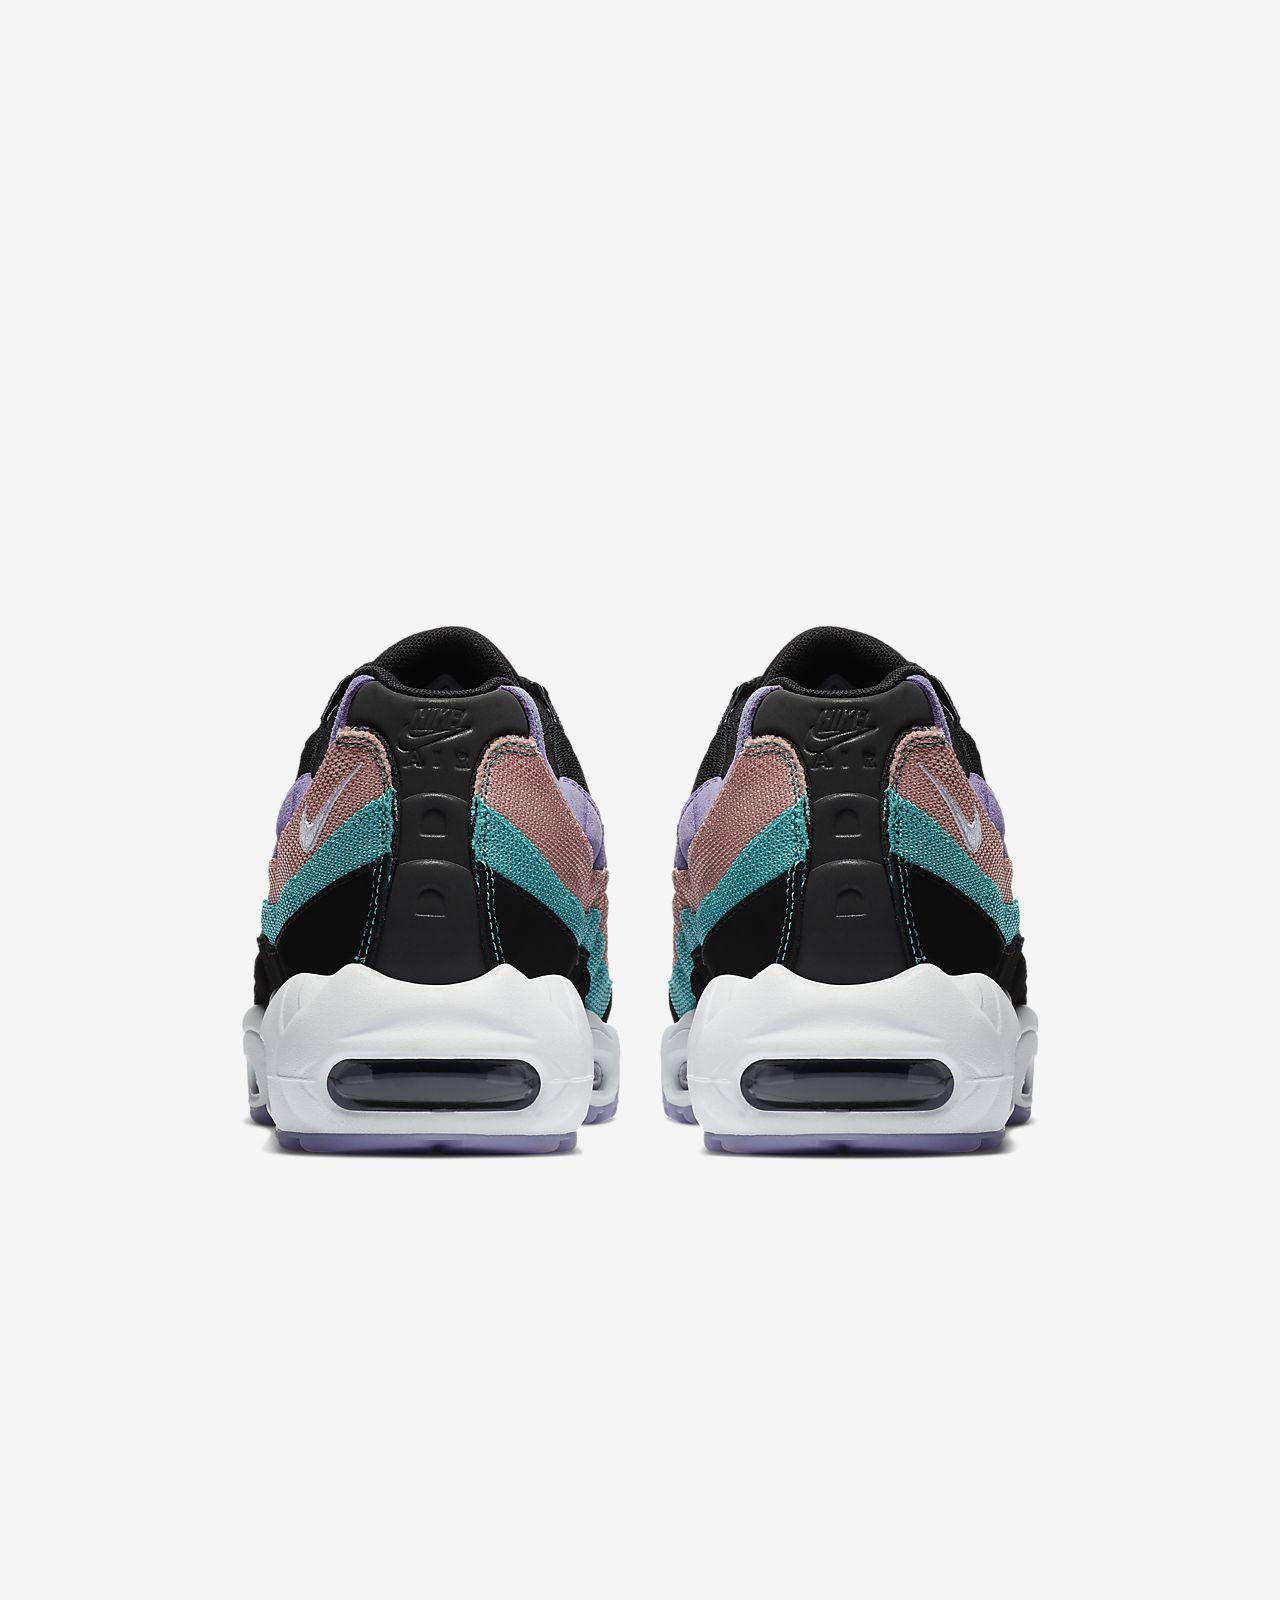 new arrival b911a d952f ... Nike Air Max 95 ND Men s Shoe